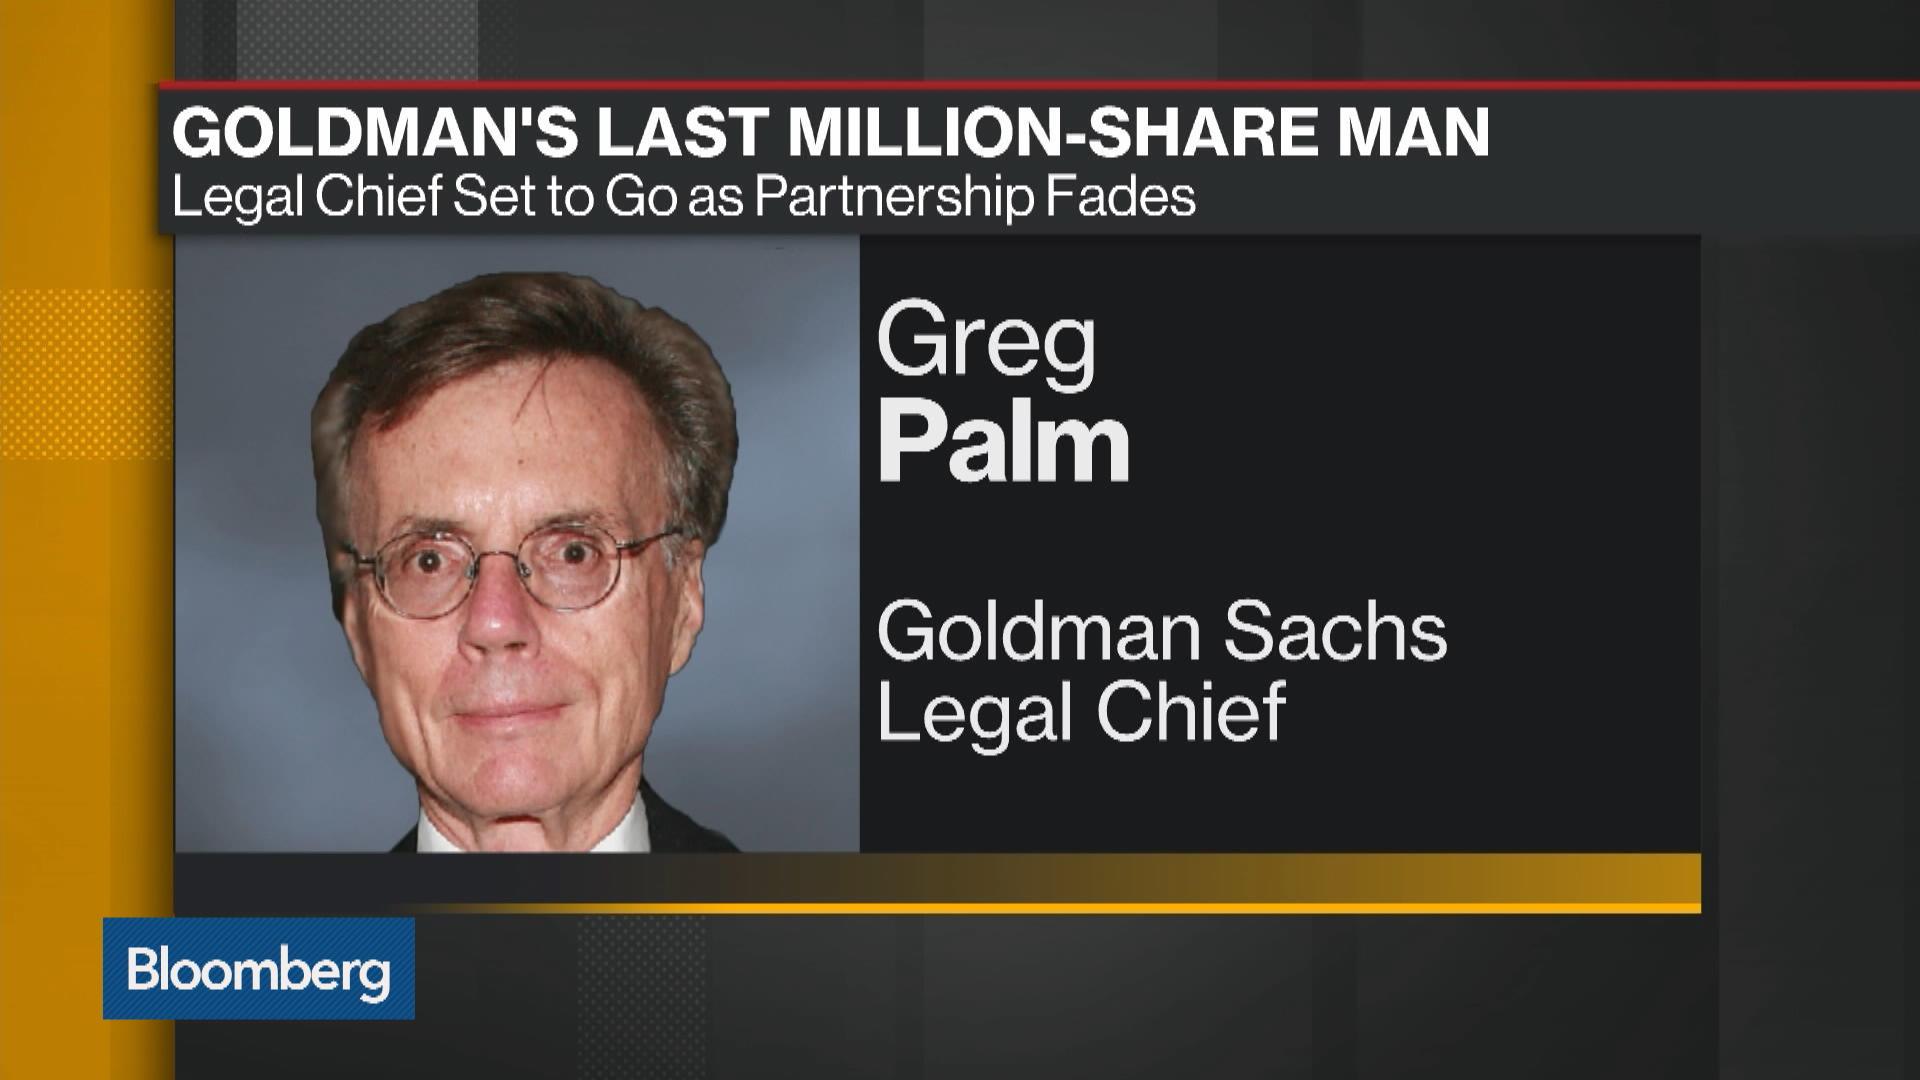 Goldman's $500 Million Lawyer Greg Palm Is Ready to Call It